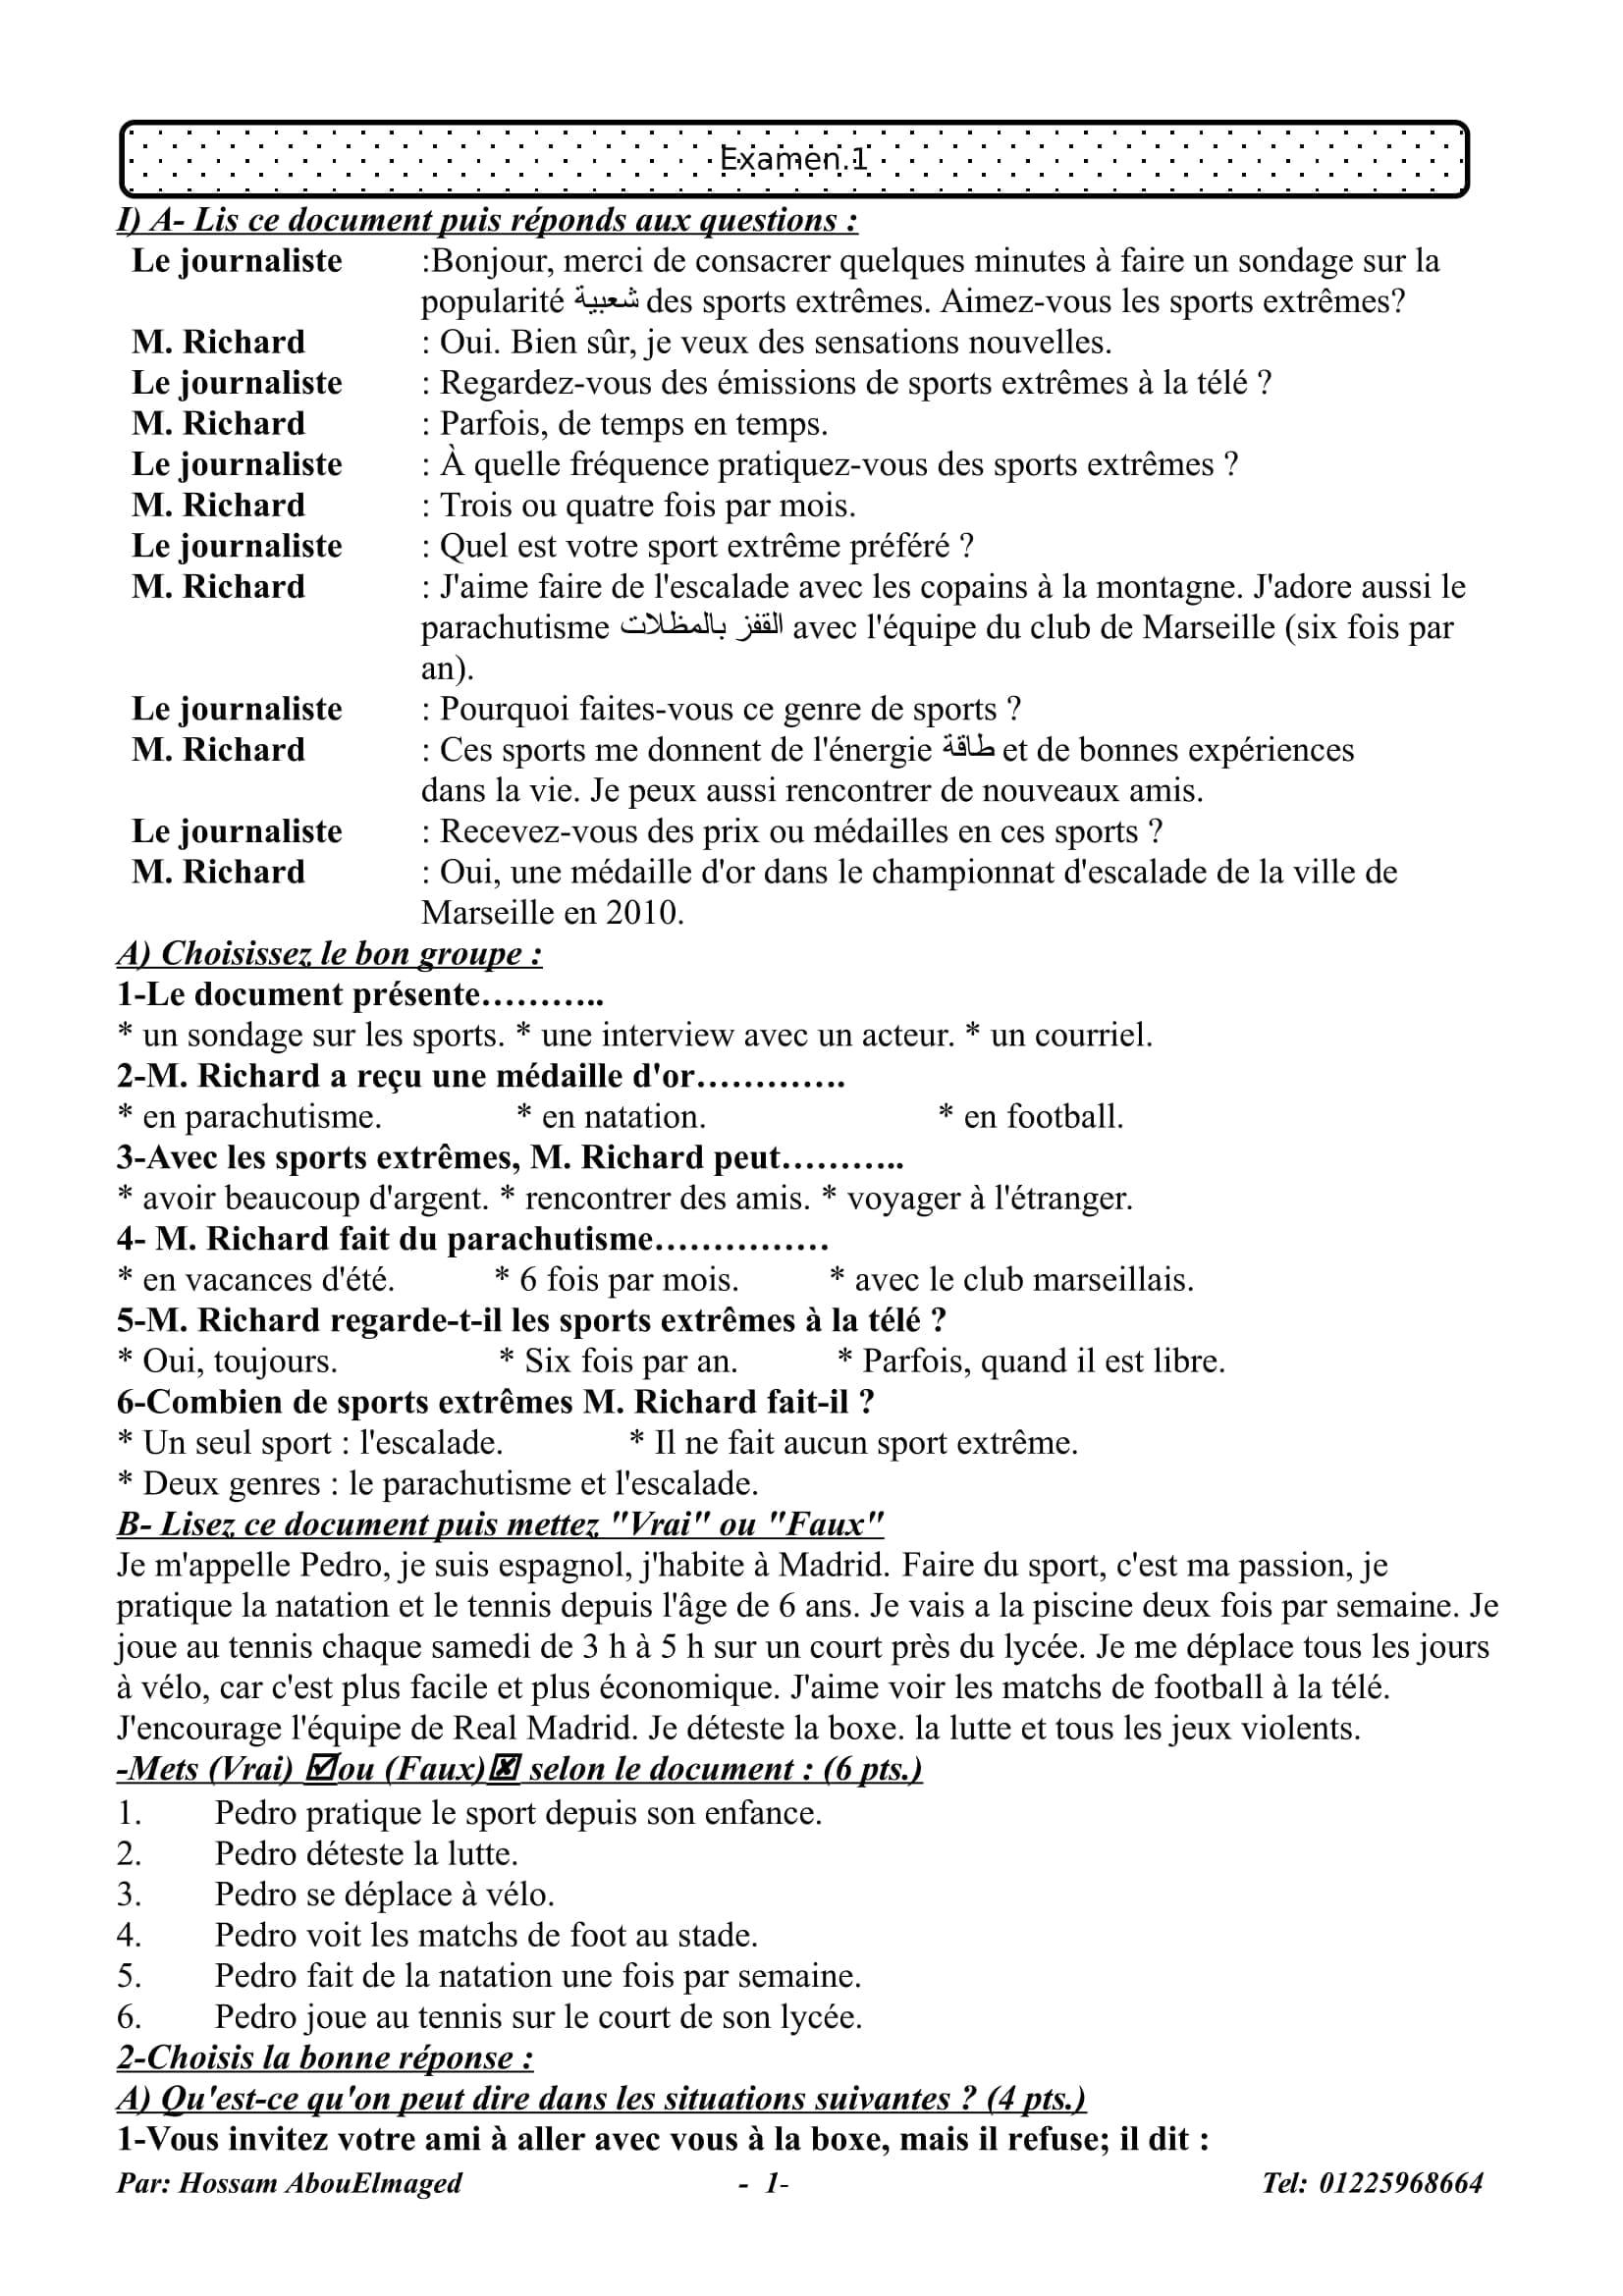 exam-eg.com_1508091885171.jpg